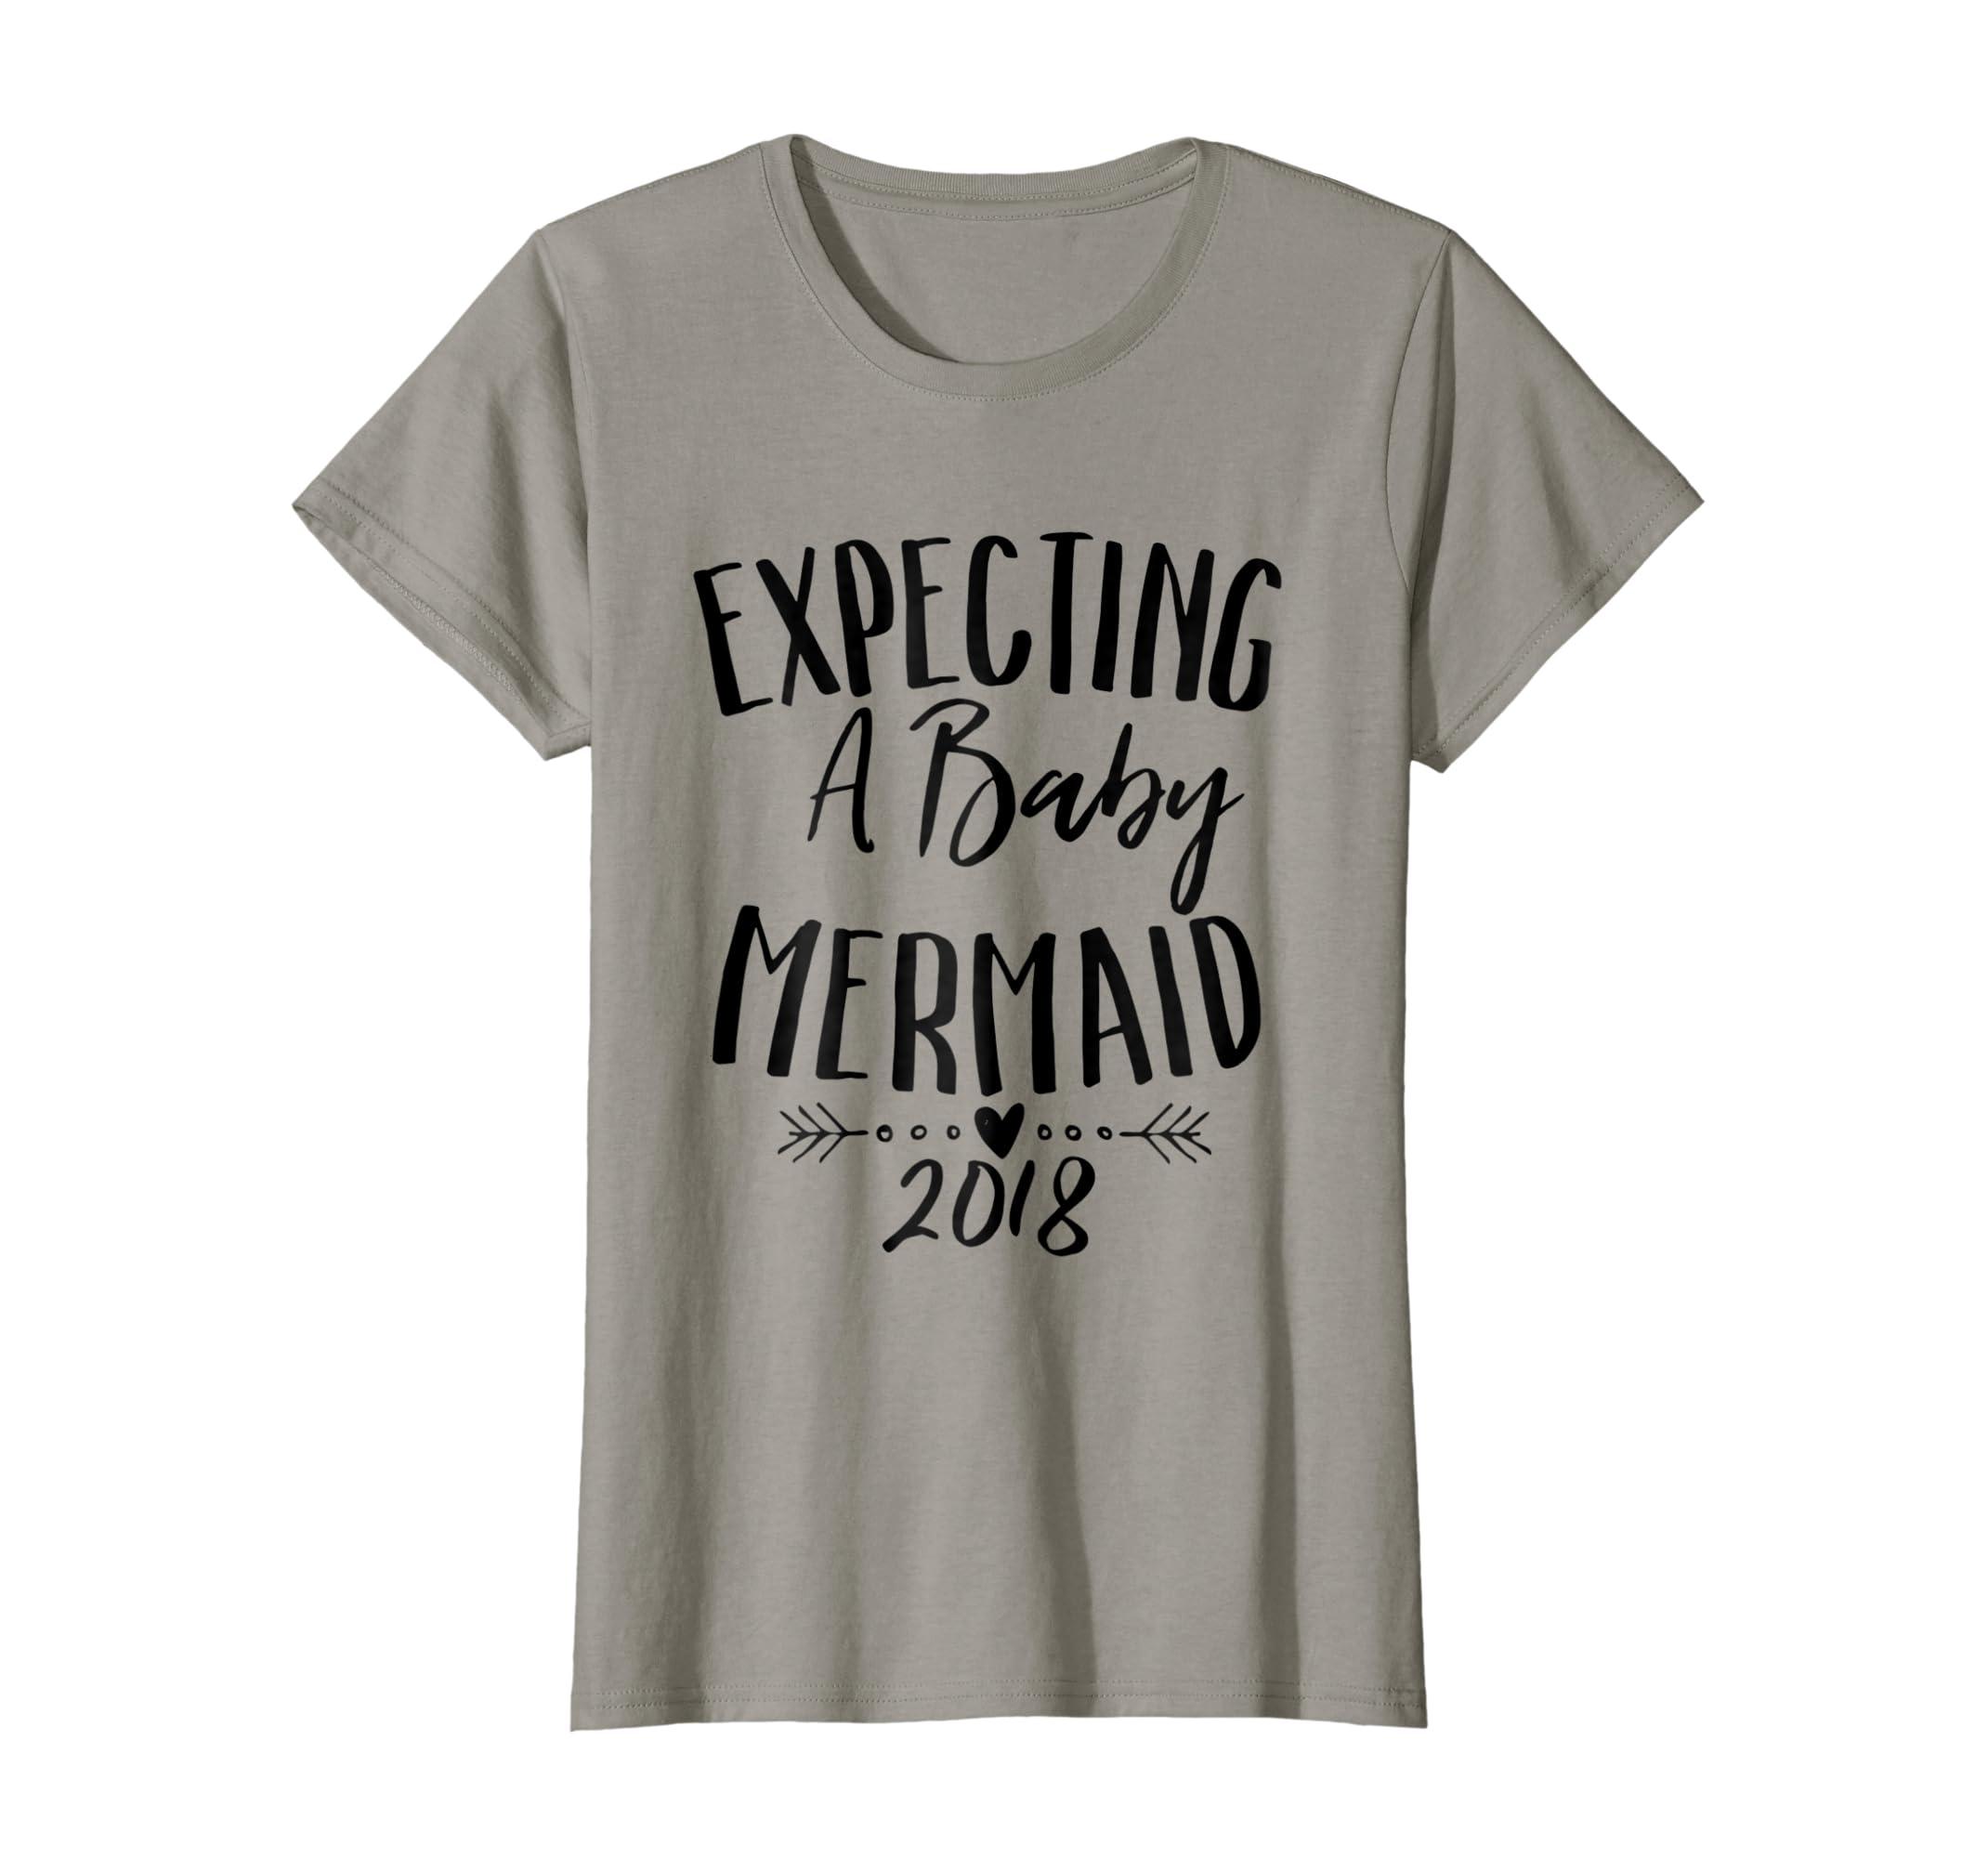 9bc72236c8624 Amazon.com: Expecting A Baby Mermaid Shirt 2018 Pregnancy Cute Tee: Clothing